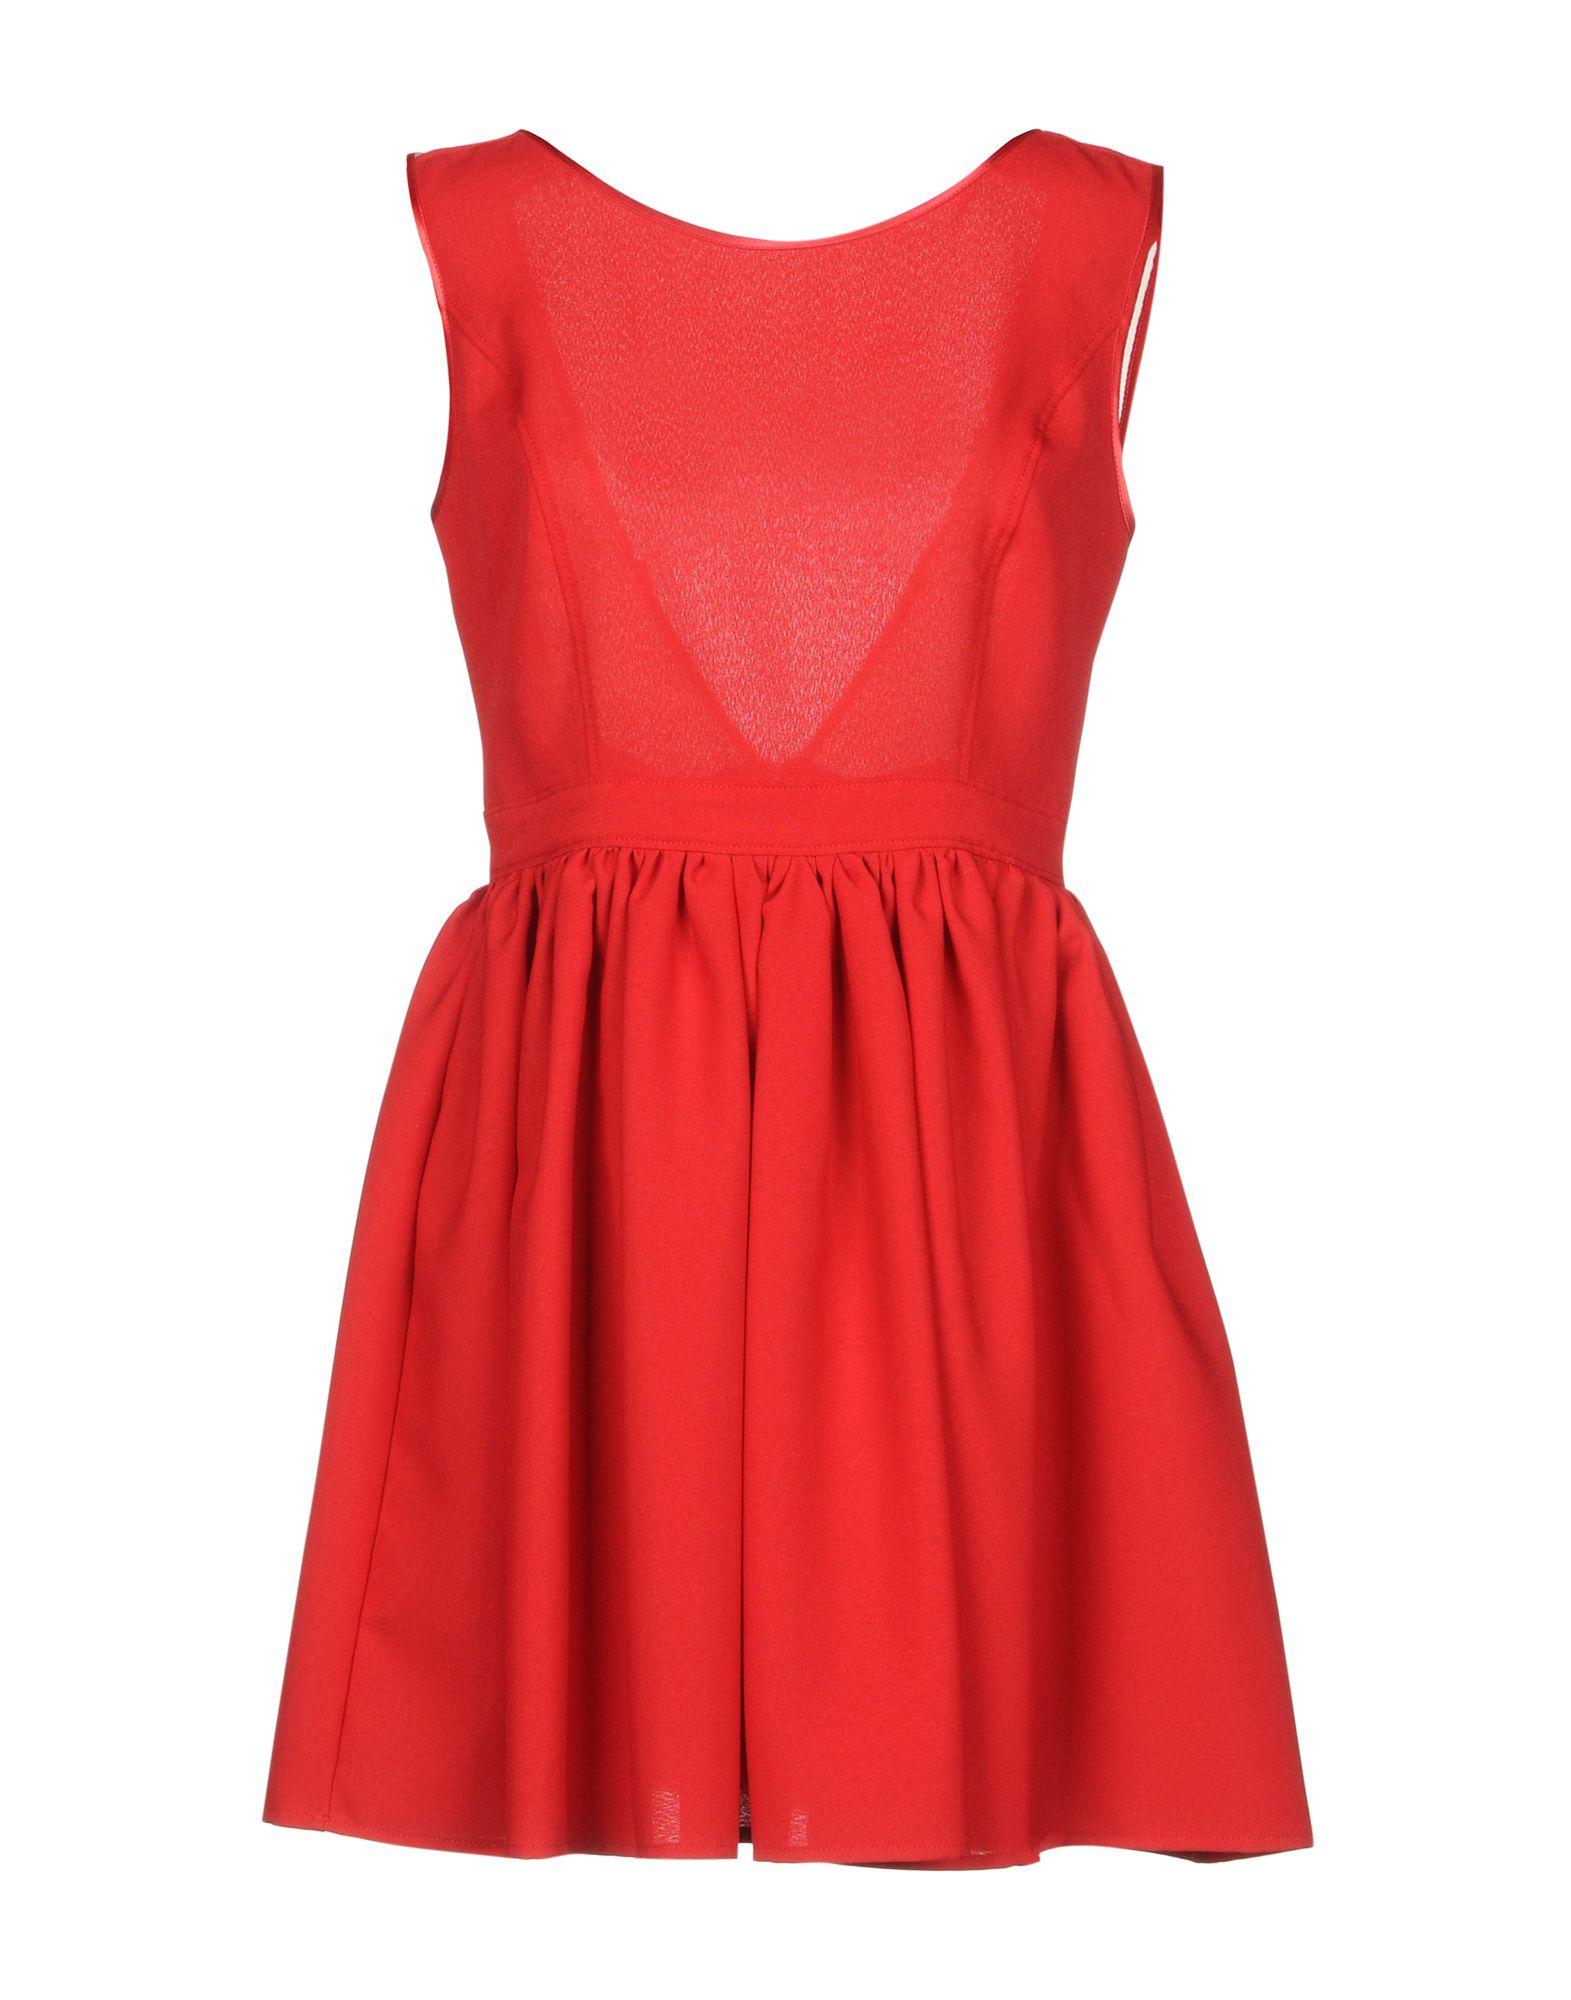 FRANCESCA & VERONICA FELEPPA Короткое платье цены онлайн